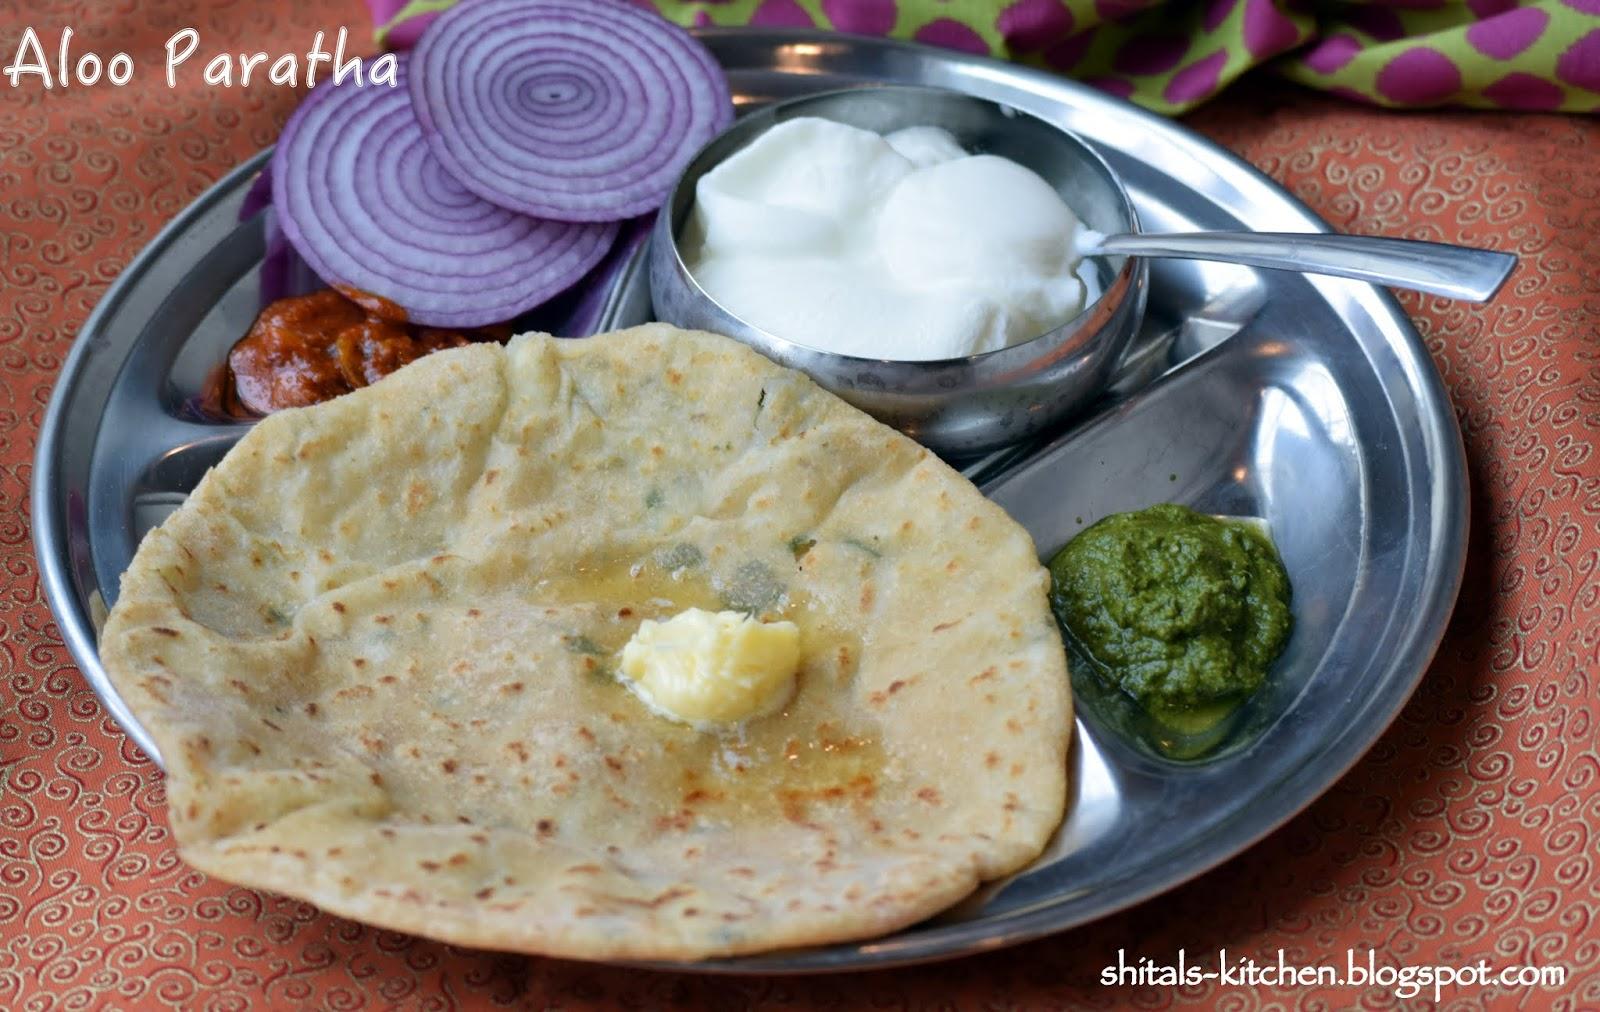 Shital's-Kitchen: Aloo Paratha/ Flat Bread Stuffed with Potatoes